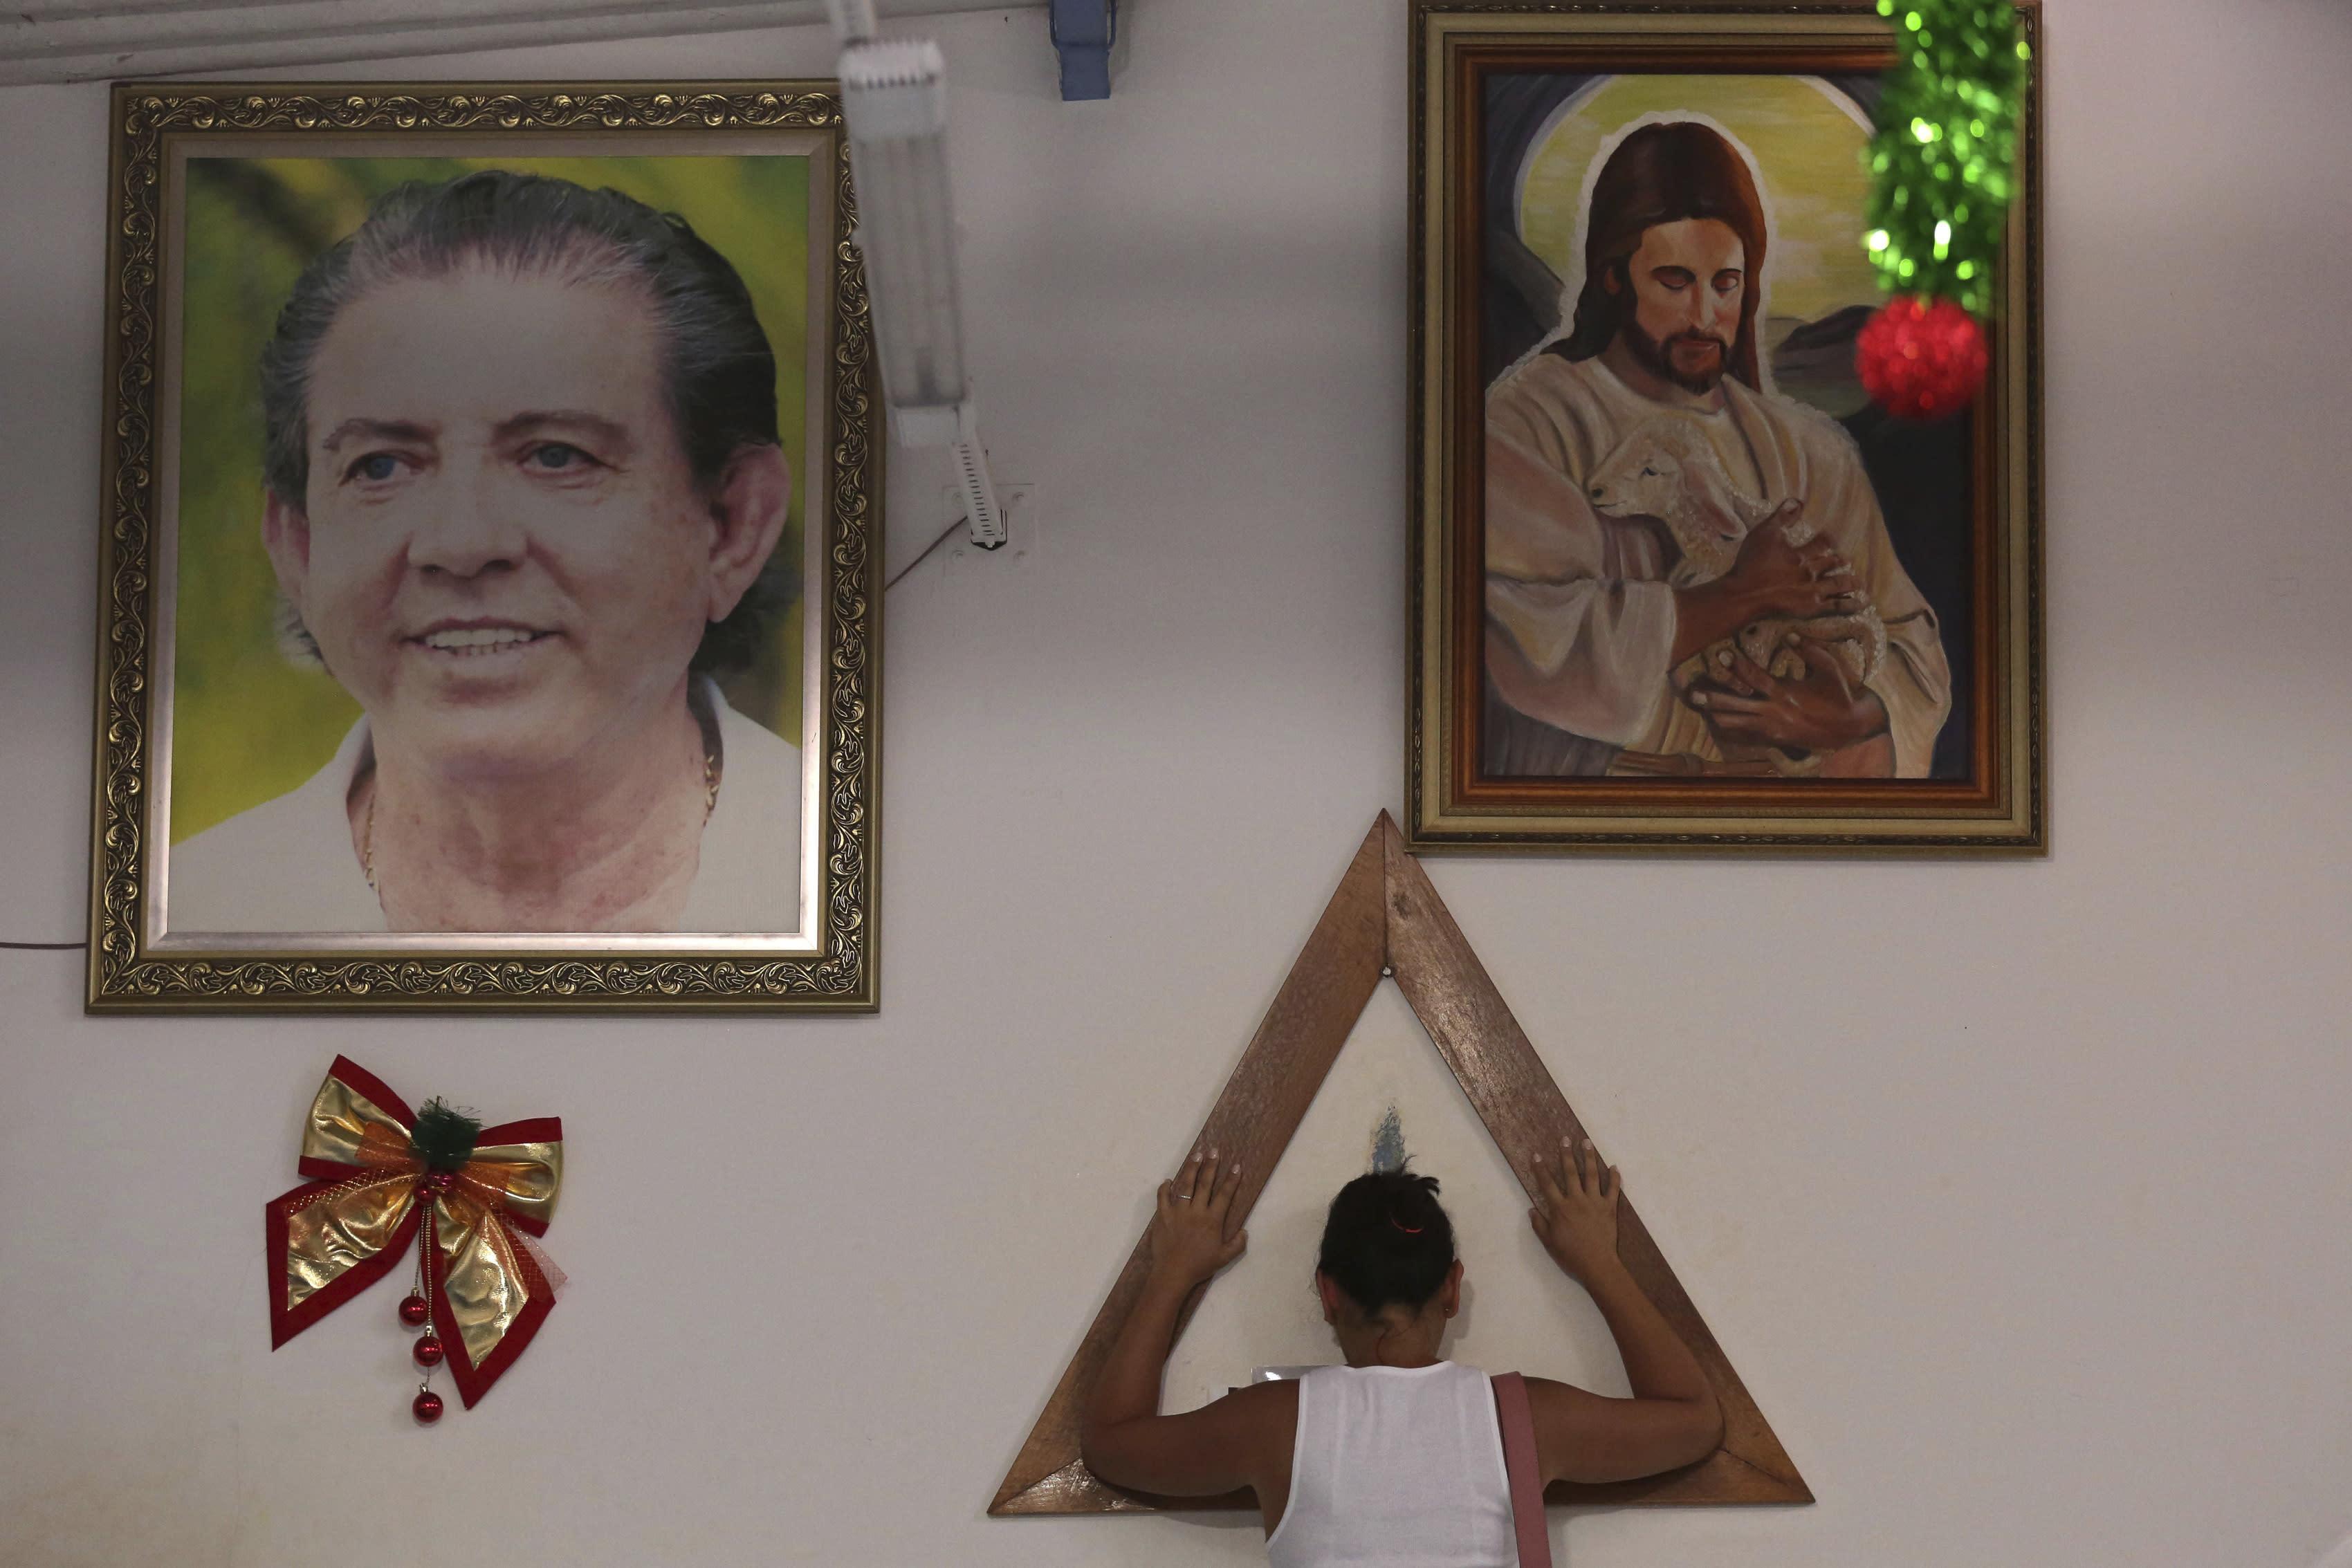 Brazil's #metoo moment: Spiritual guru accused of sex abuse